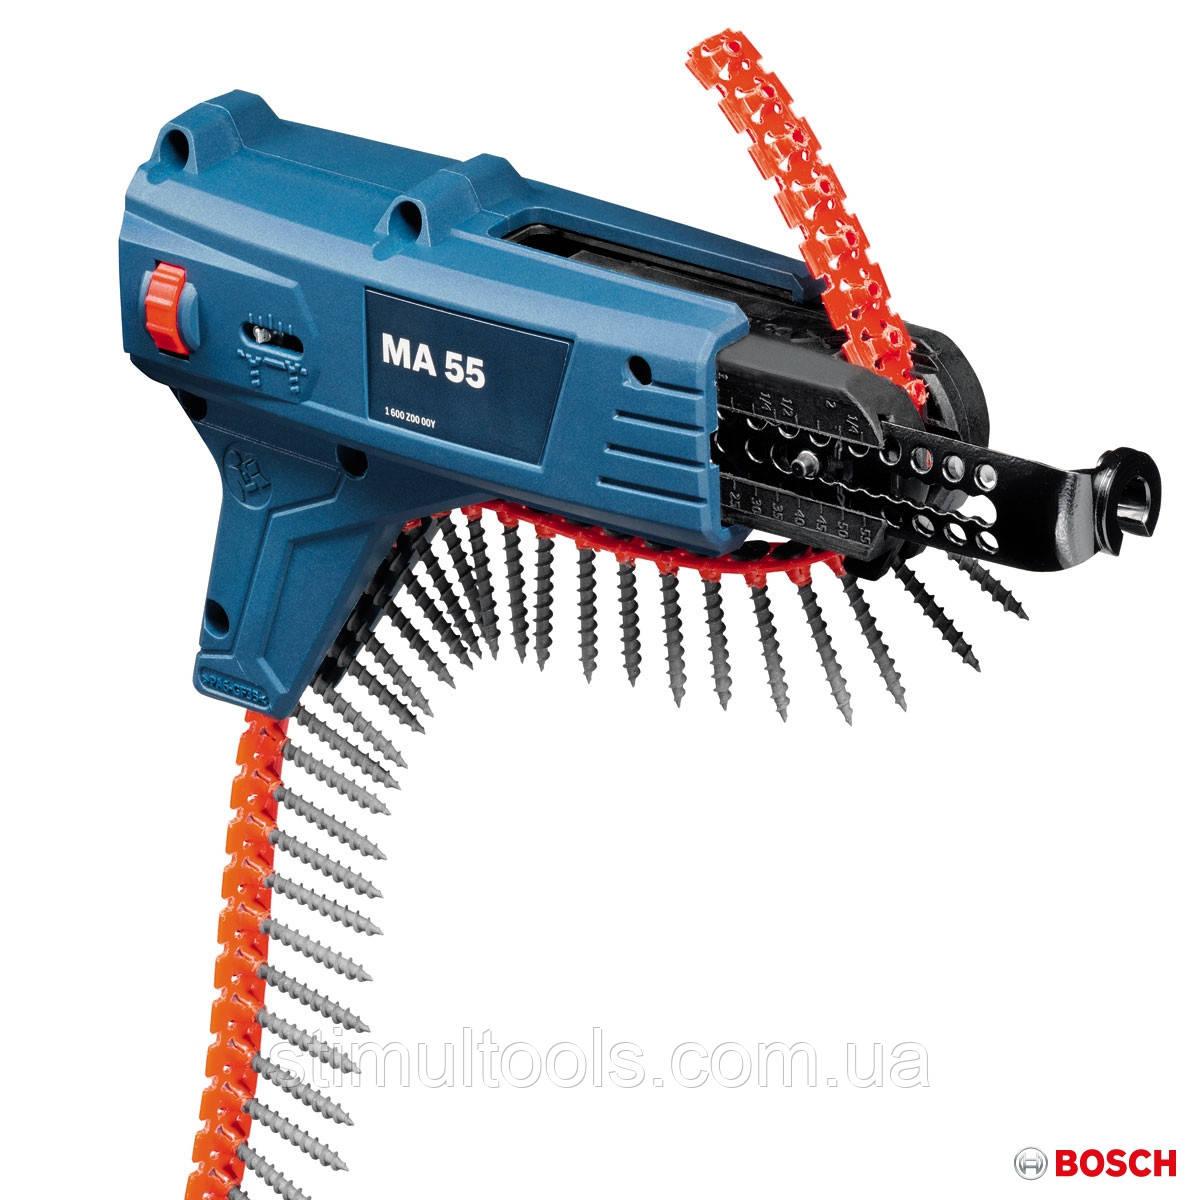 Магазинная насадка Bosch MA 55